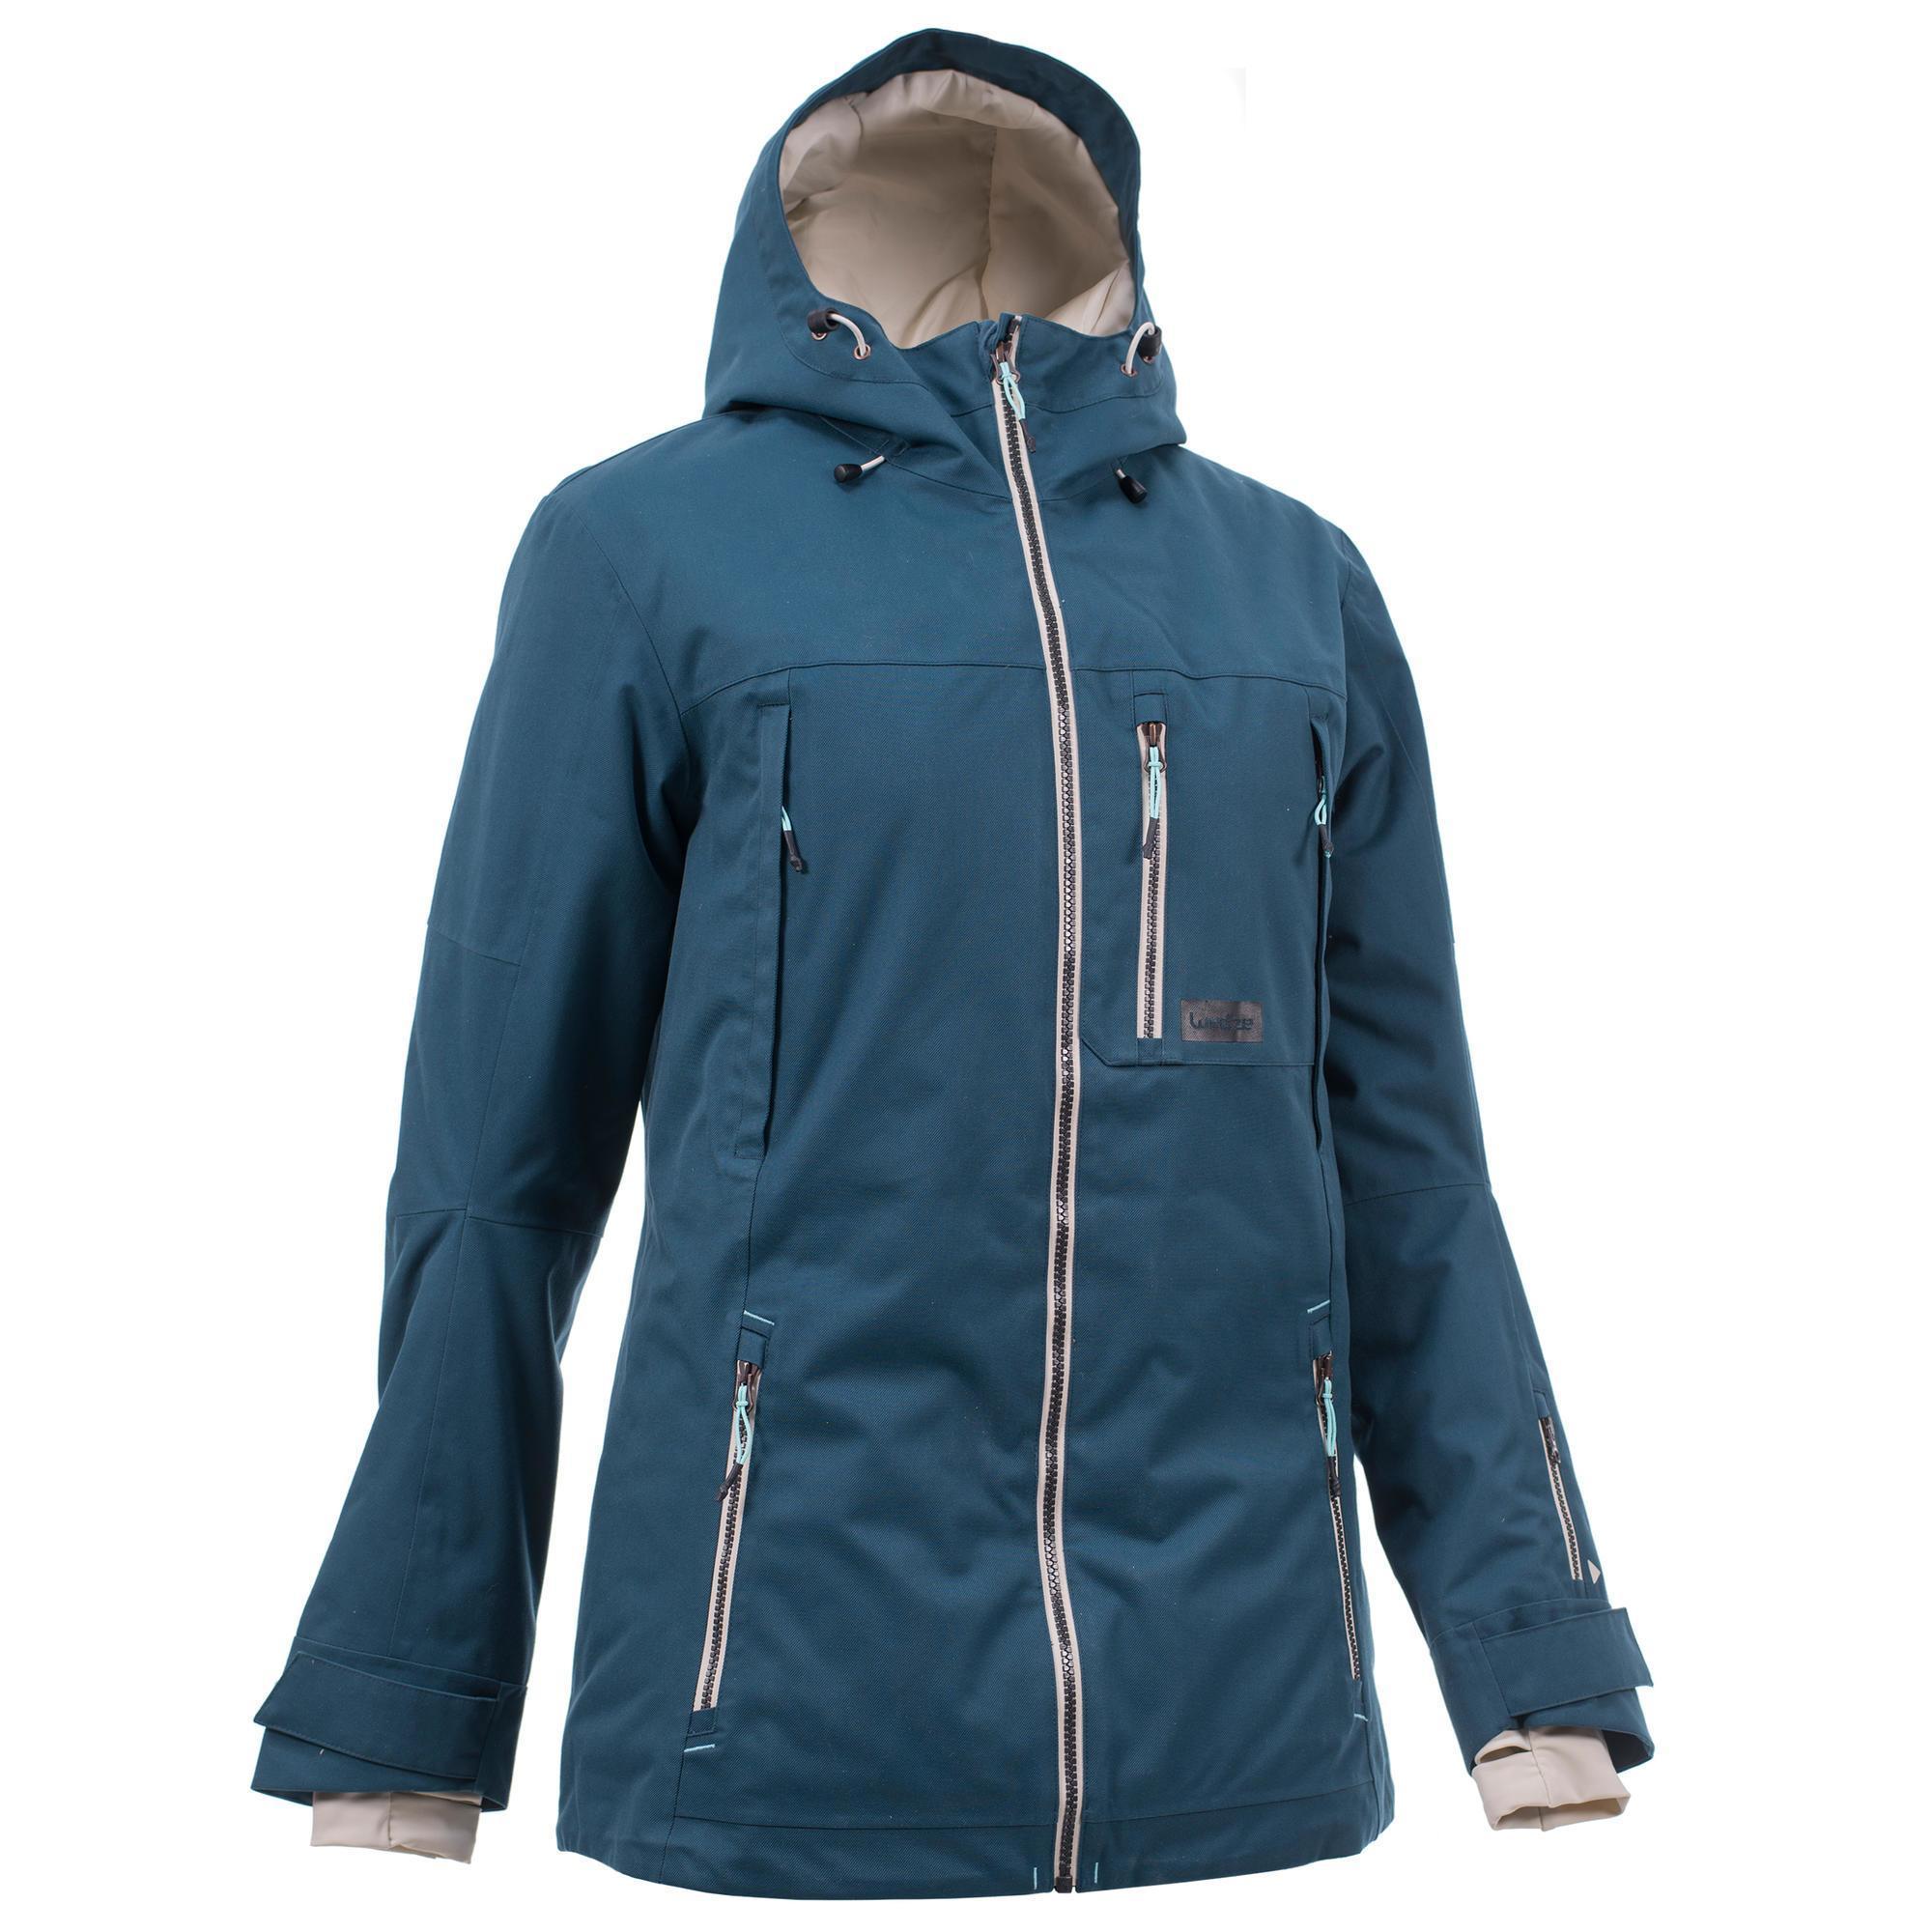 Wed'ze Snowboard- en ski-jas voor dames SNB JKT 500 donker petrol